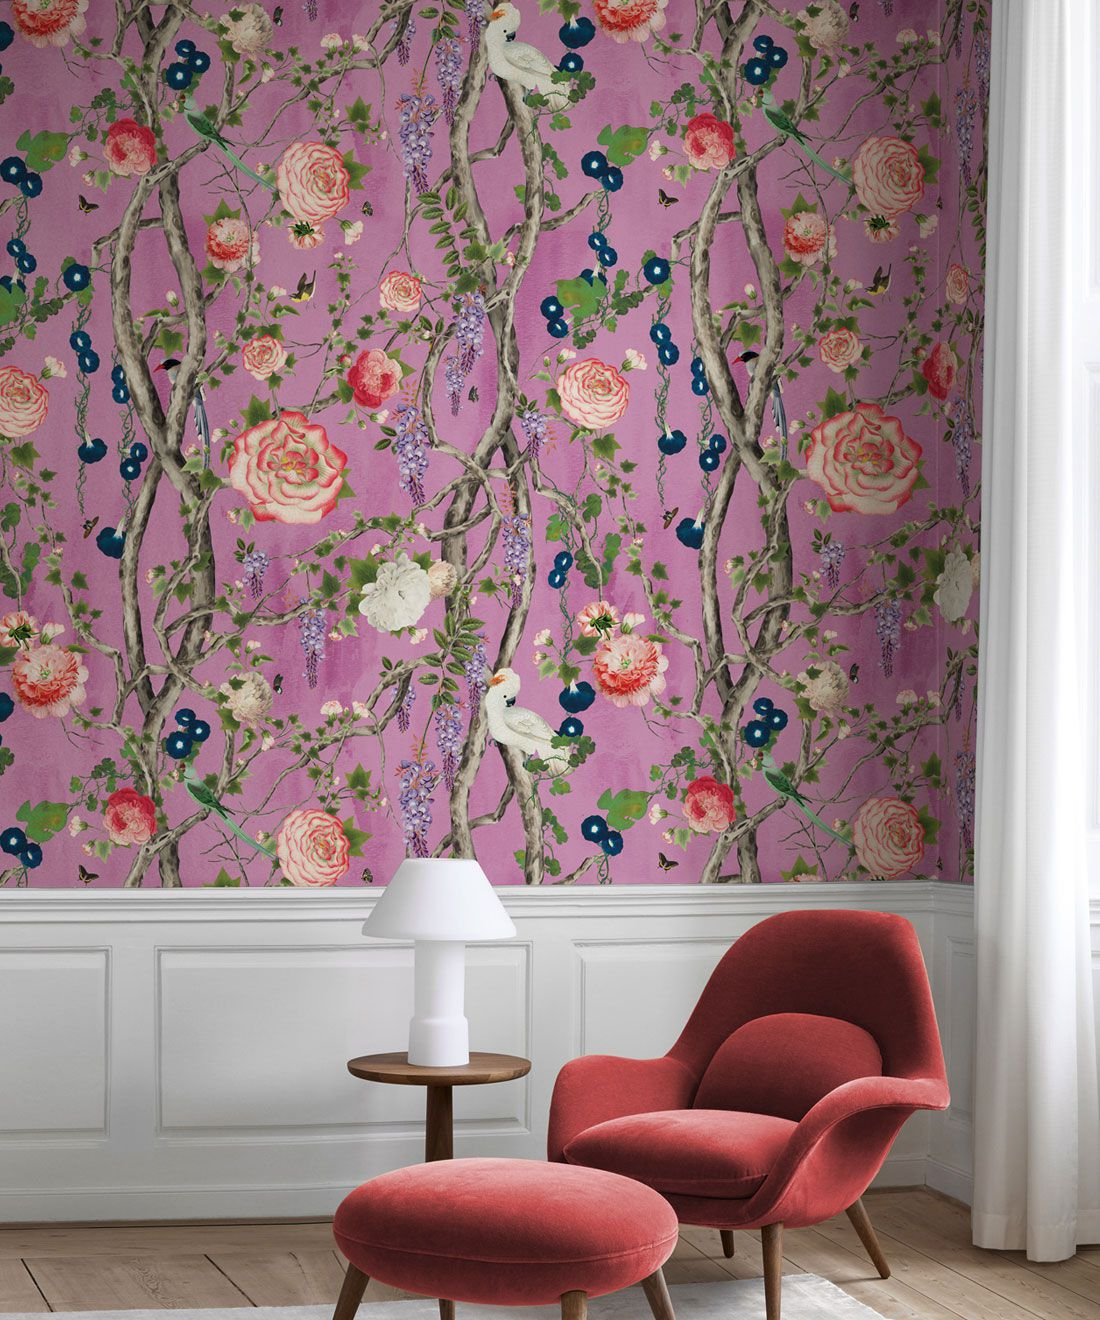 Empress Wallpaper • Romantic Wallpaper • Floral Wallpaper • Chinoiserie Wallpaper • Plum Purple colour wallpaper insitu